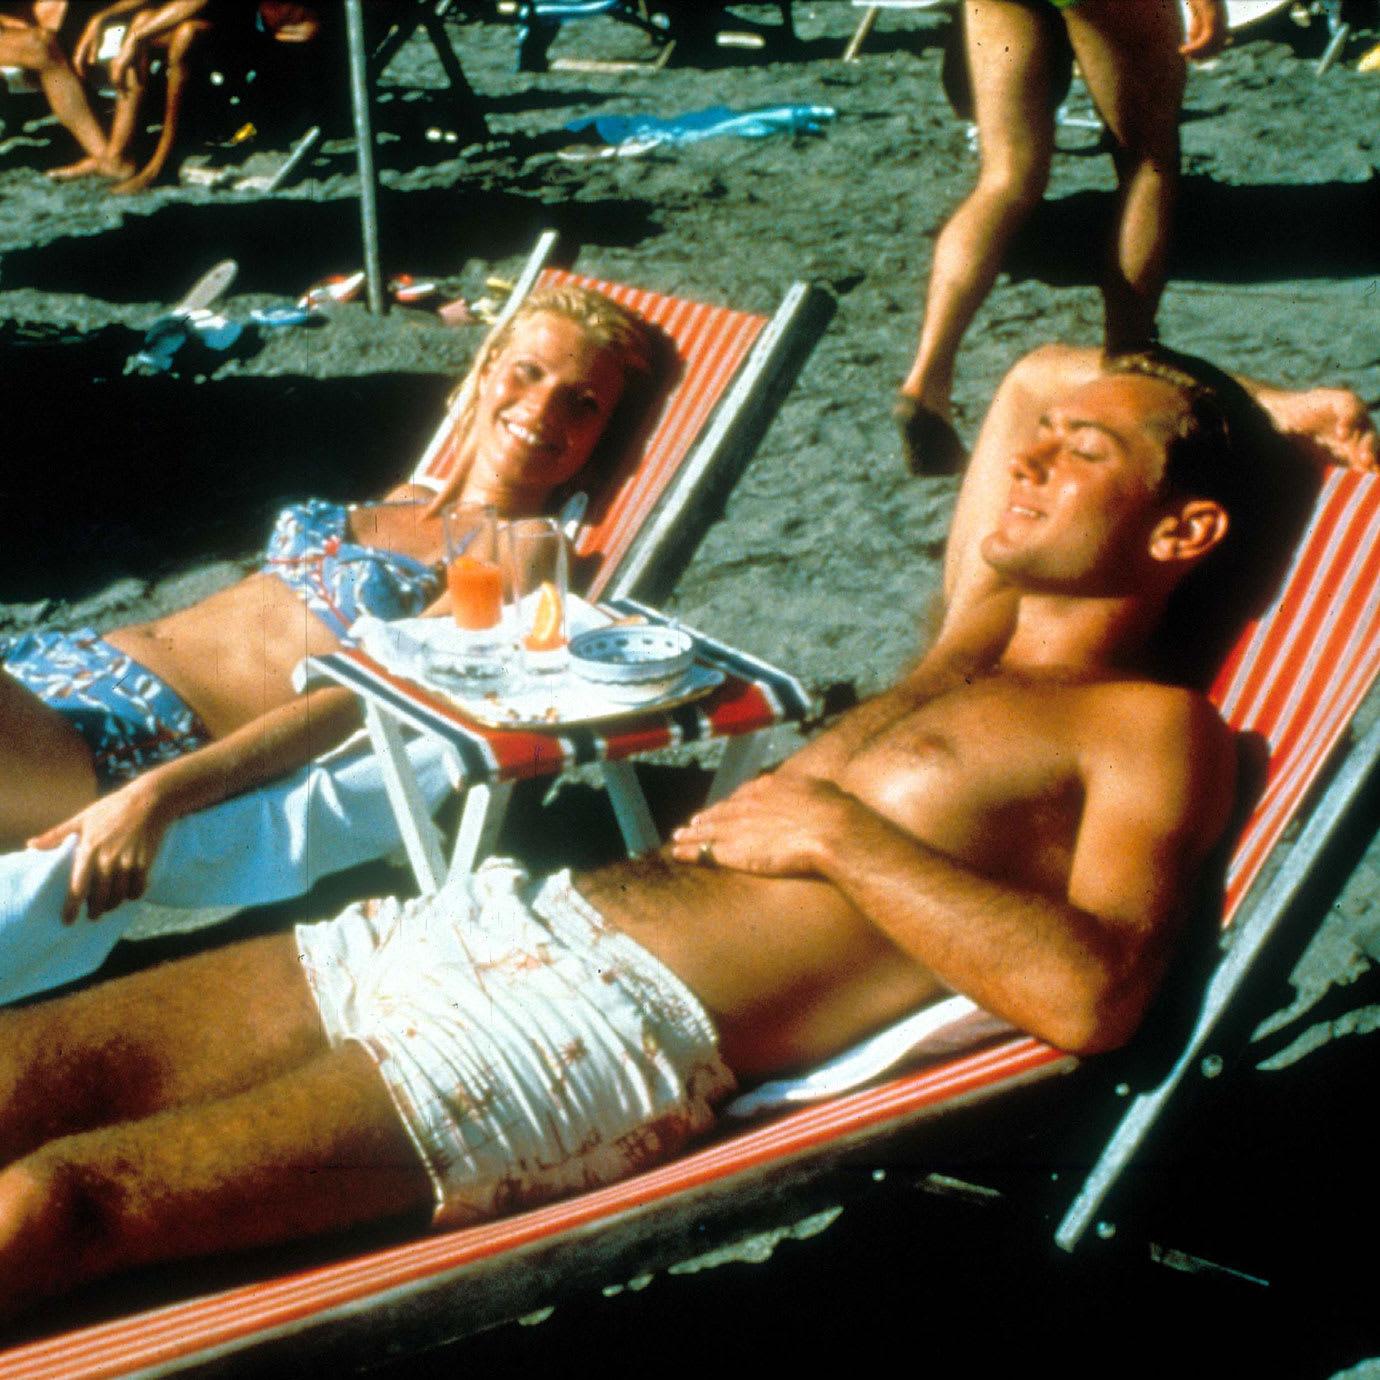 A man and a woman sunbathing on a beach.